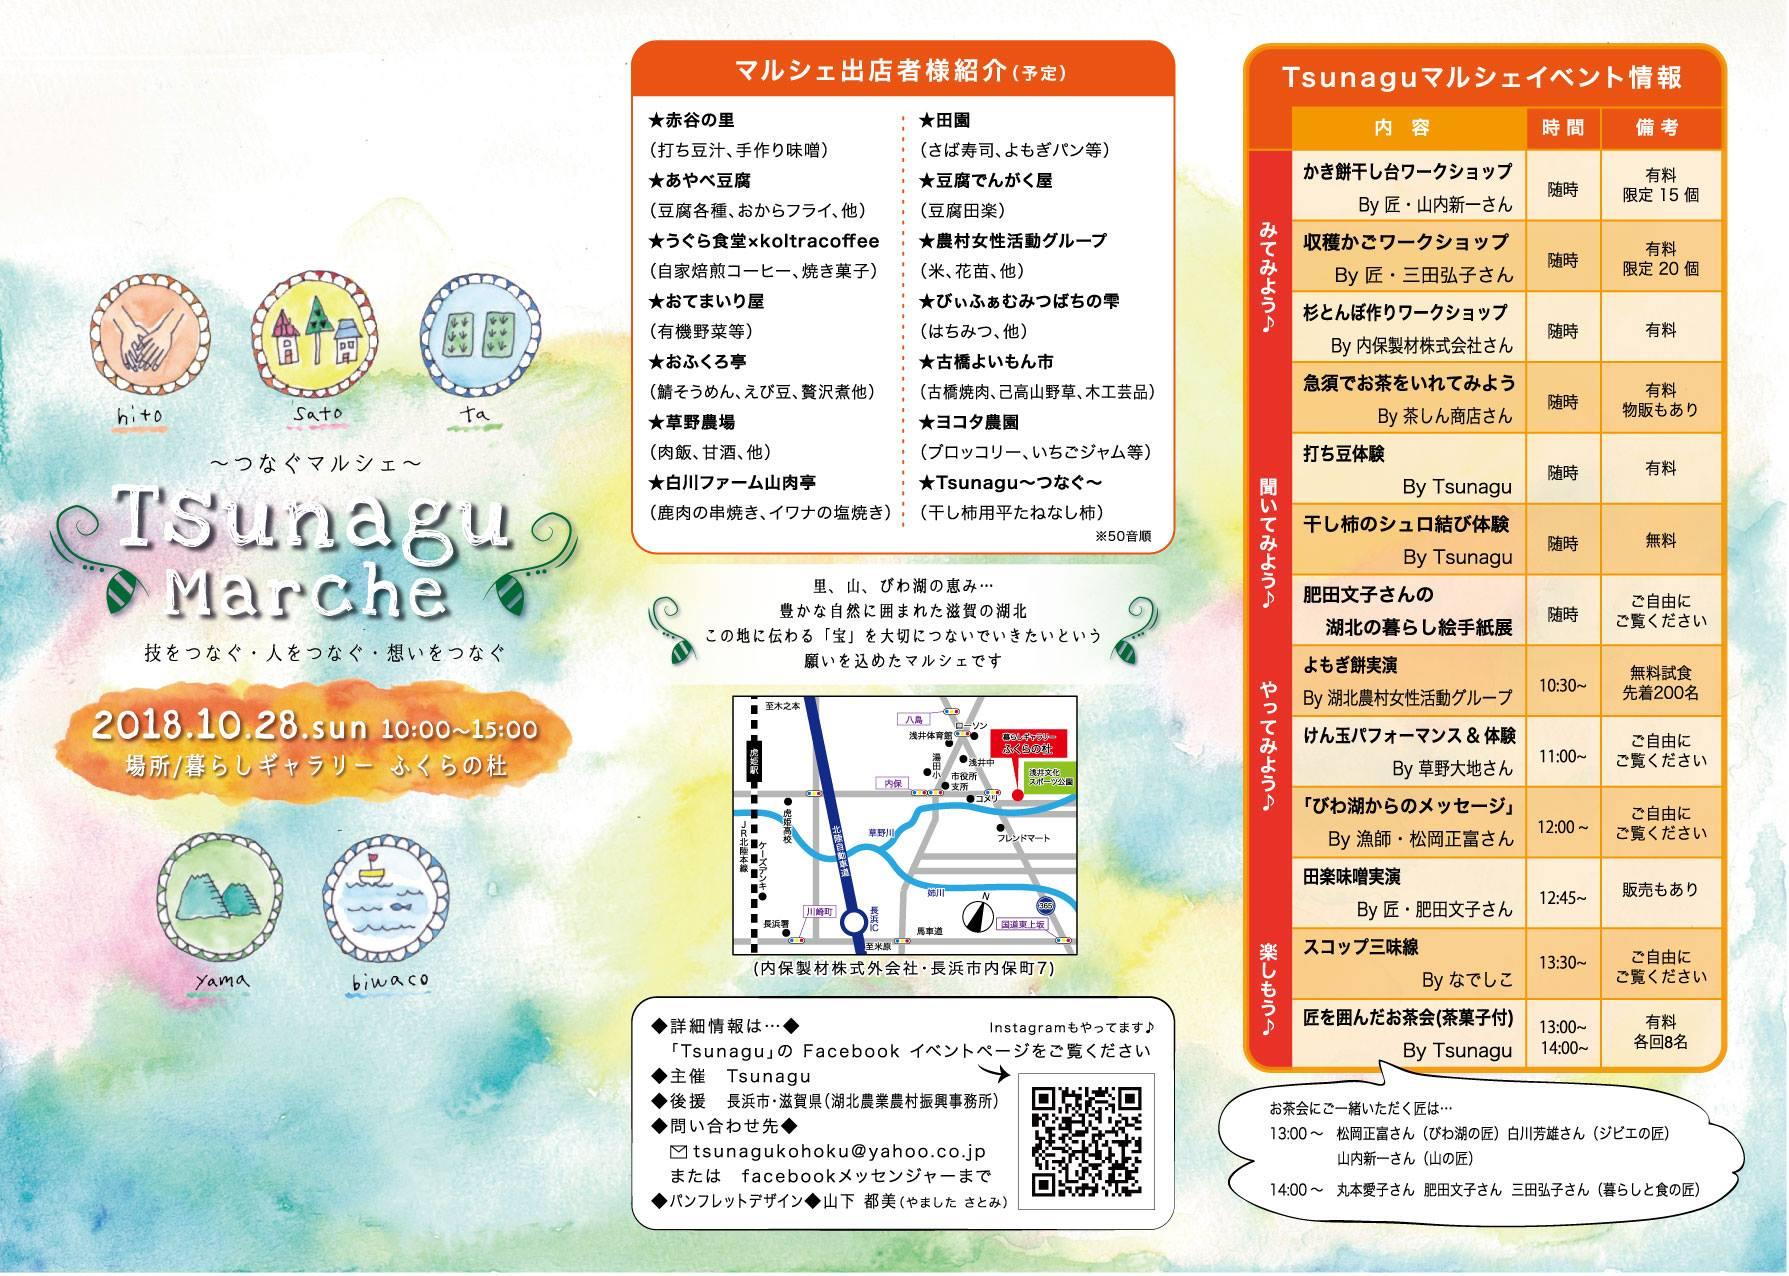 Tsunagu ~つなぐ~ マルシェ画像2